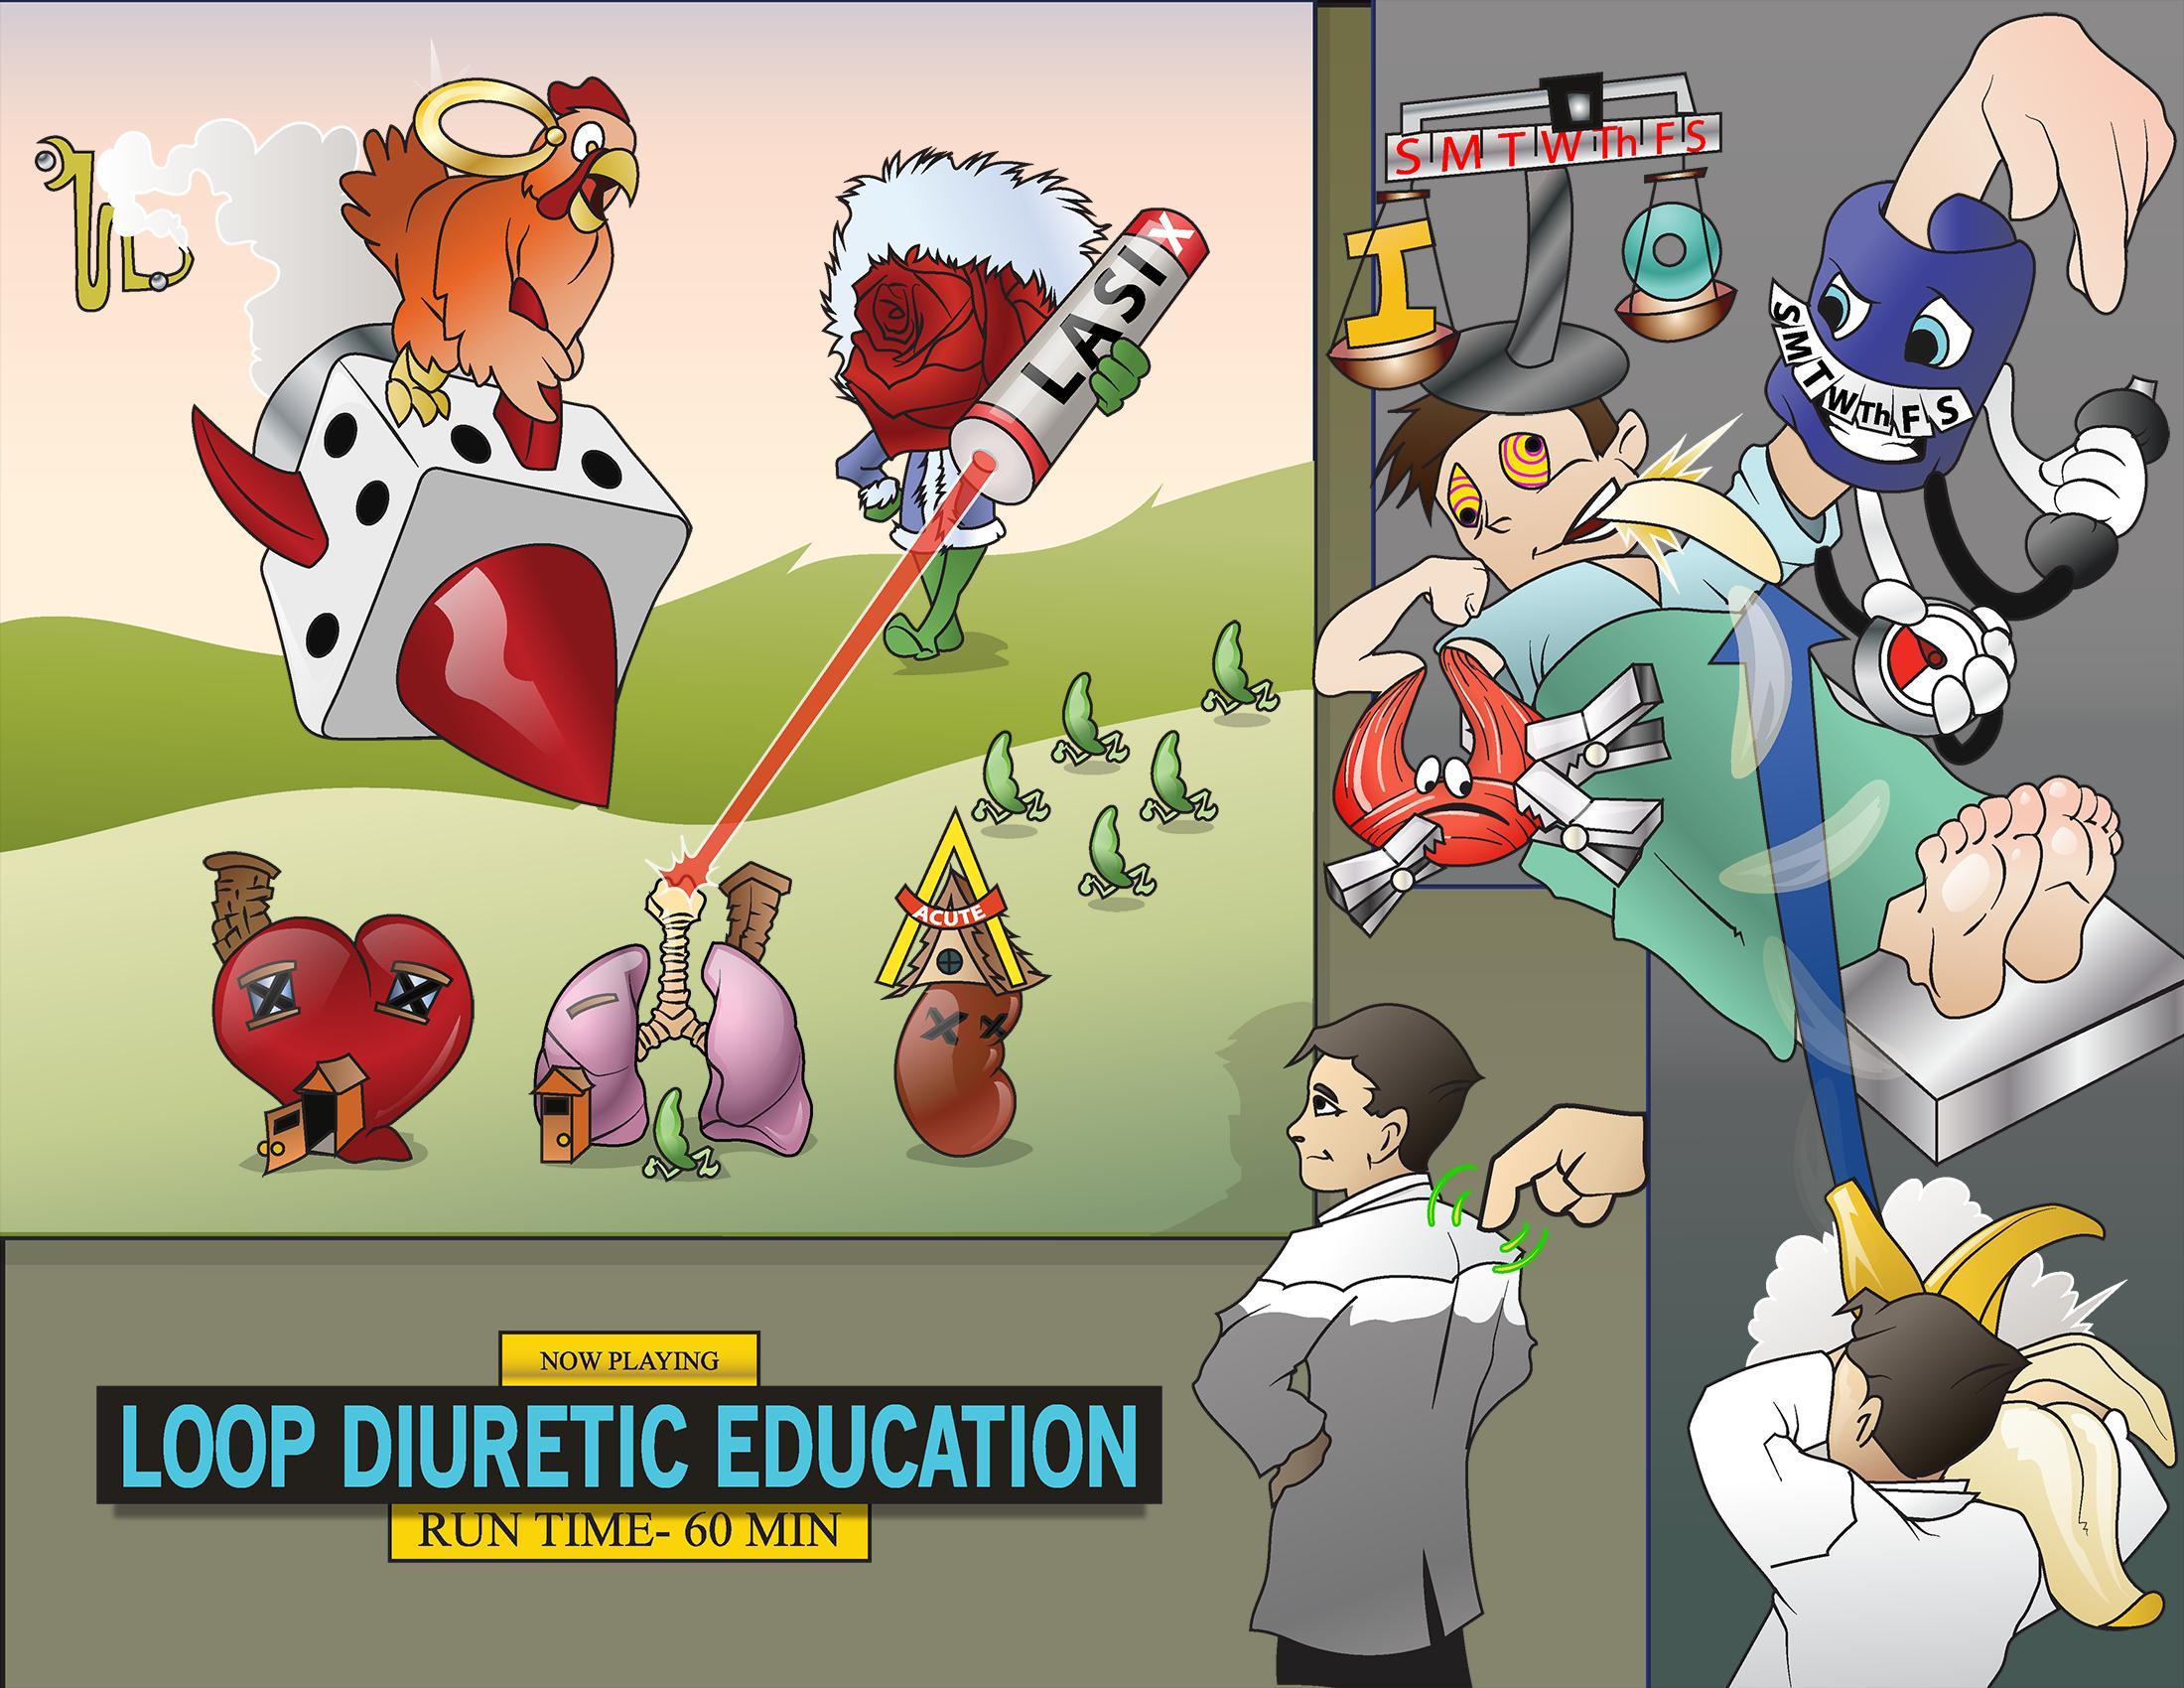 Loop Diuretic Education